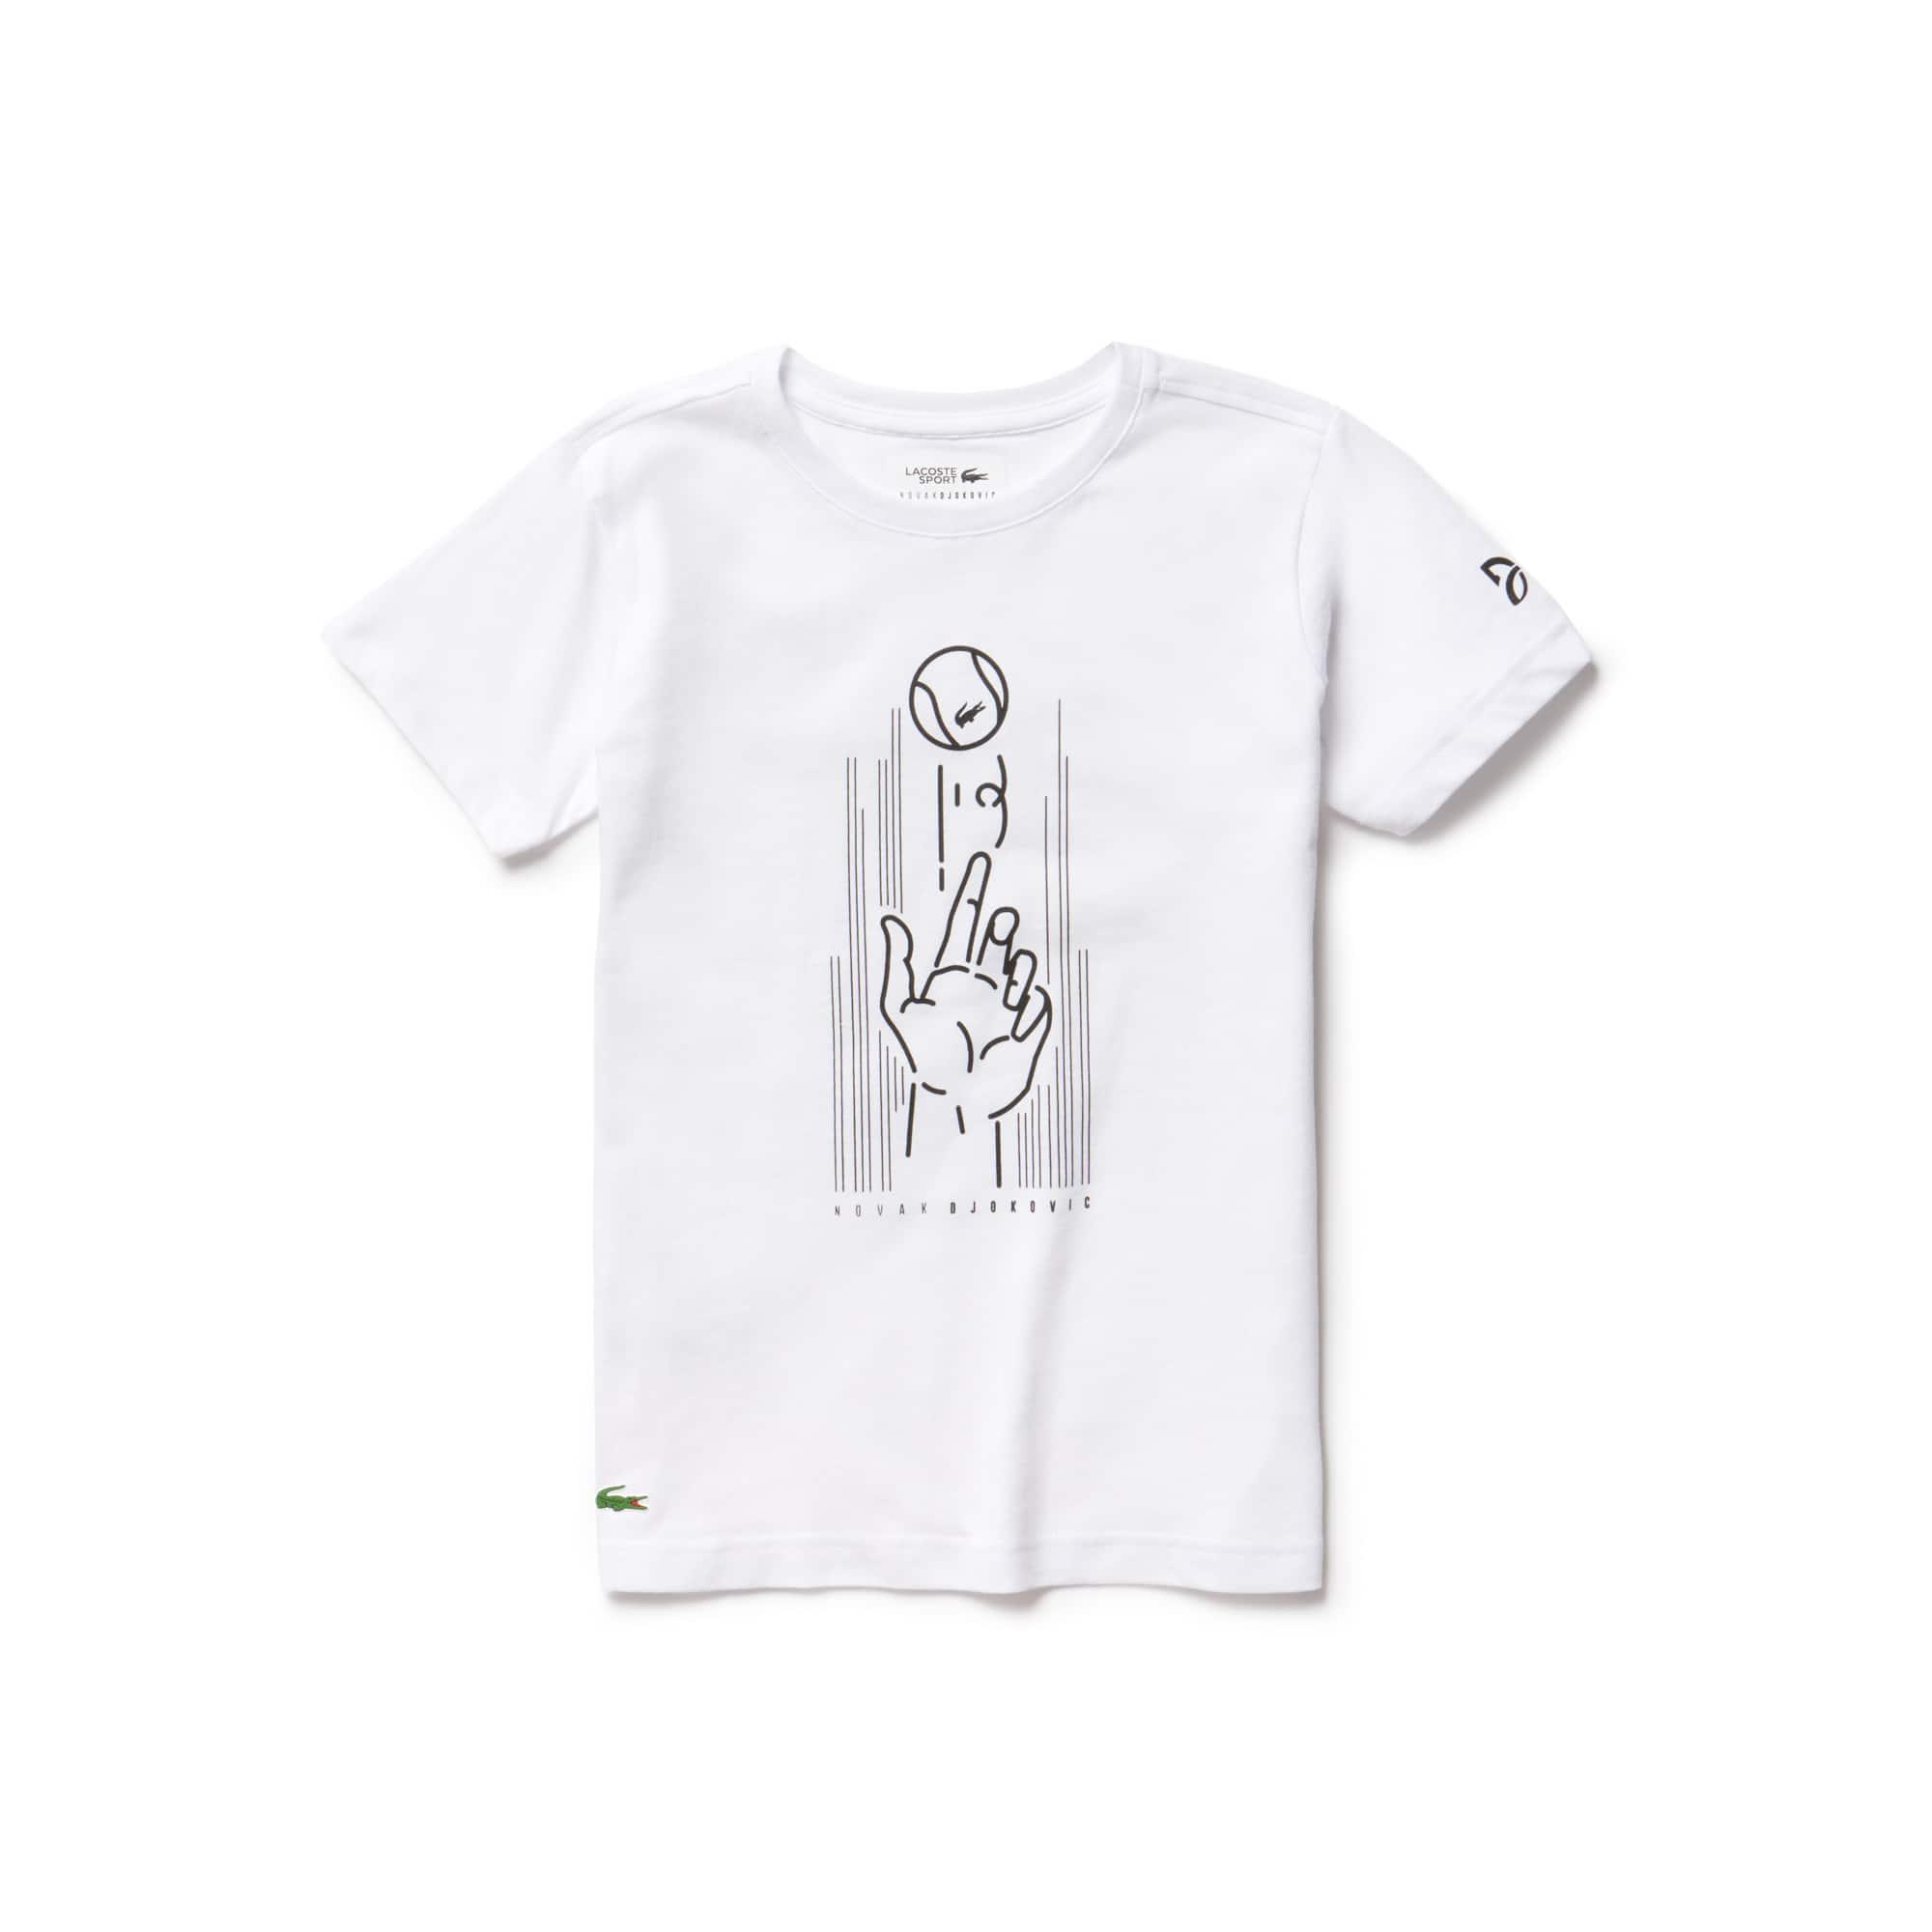 Lacoste - Camiseta De Niño Lacoste SPORT Novak Djokovic Support With Style -Off Court Collection En Tejido De Punto Técnico Estampado - 1